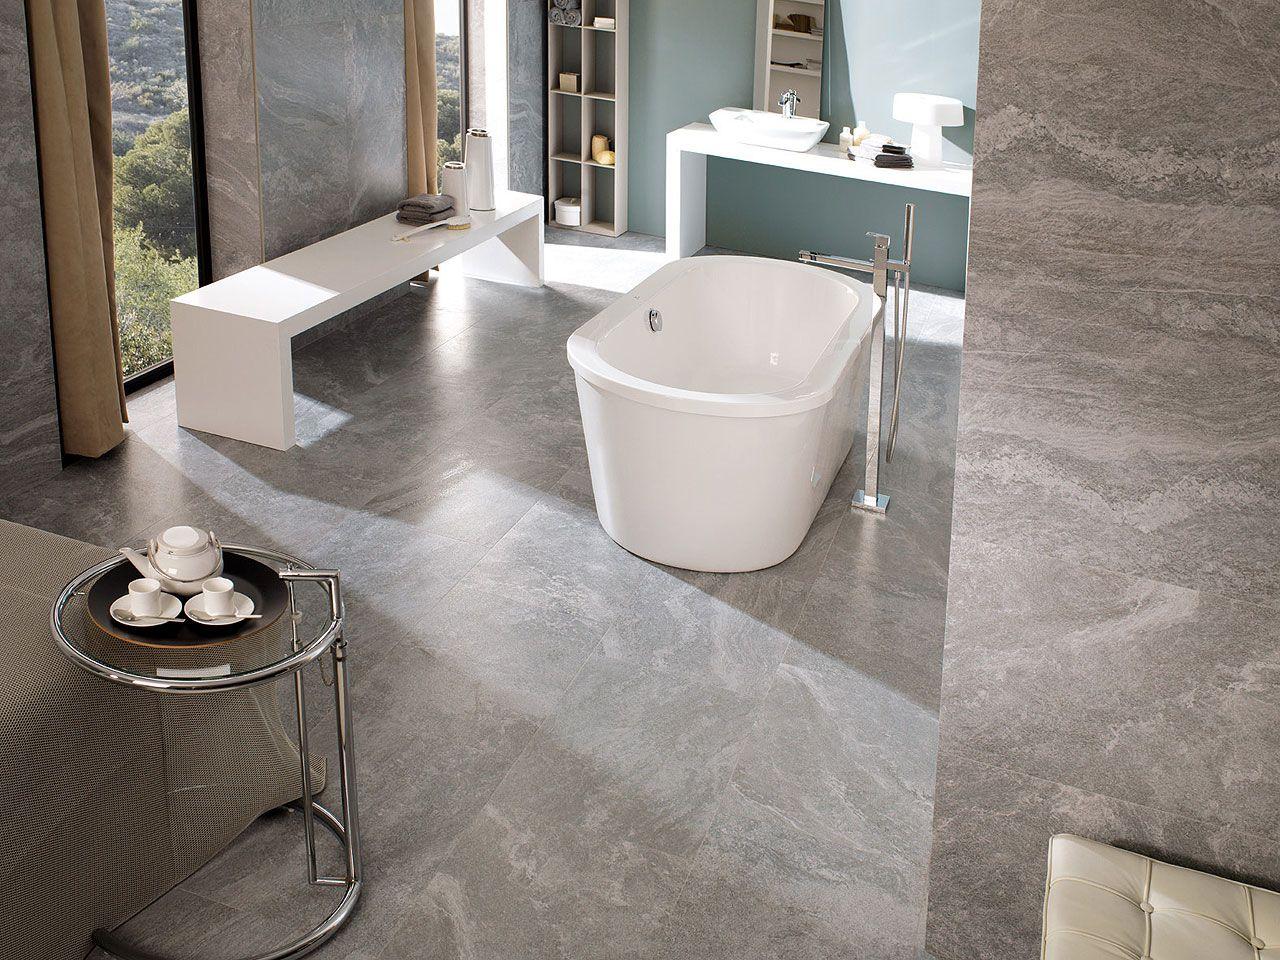 Stylish bathroom with porcelanosas tiles floor tiles ston ker stylish bathroom with porcelanosas tiles floor tiles ston ker zurich grey wall dailygadgetfo Images